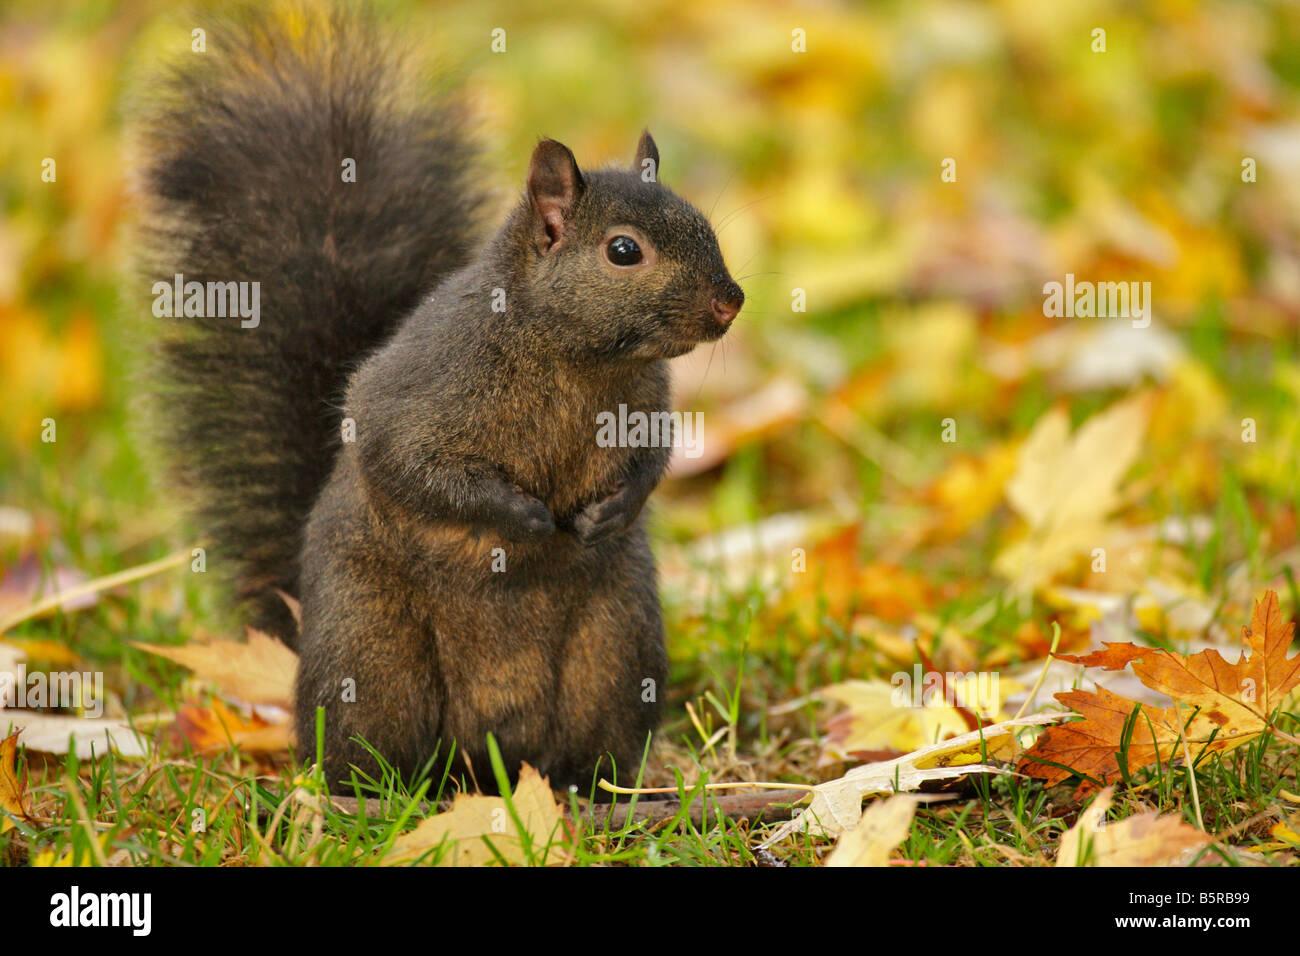 Black squirrel sub species of grey squirrel in leaves in fall Victoria British Columbia Canada Stock Photo